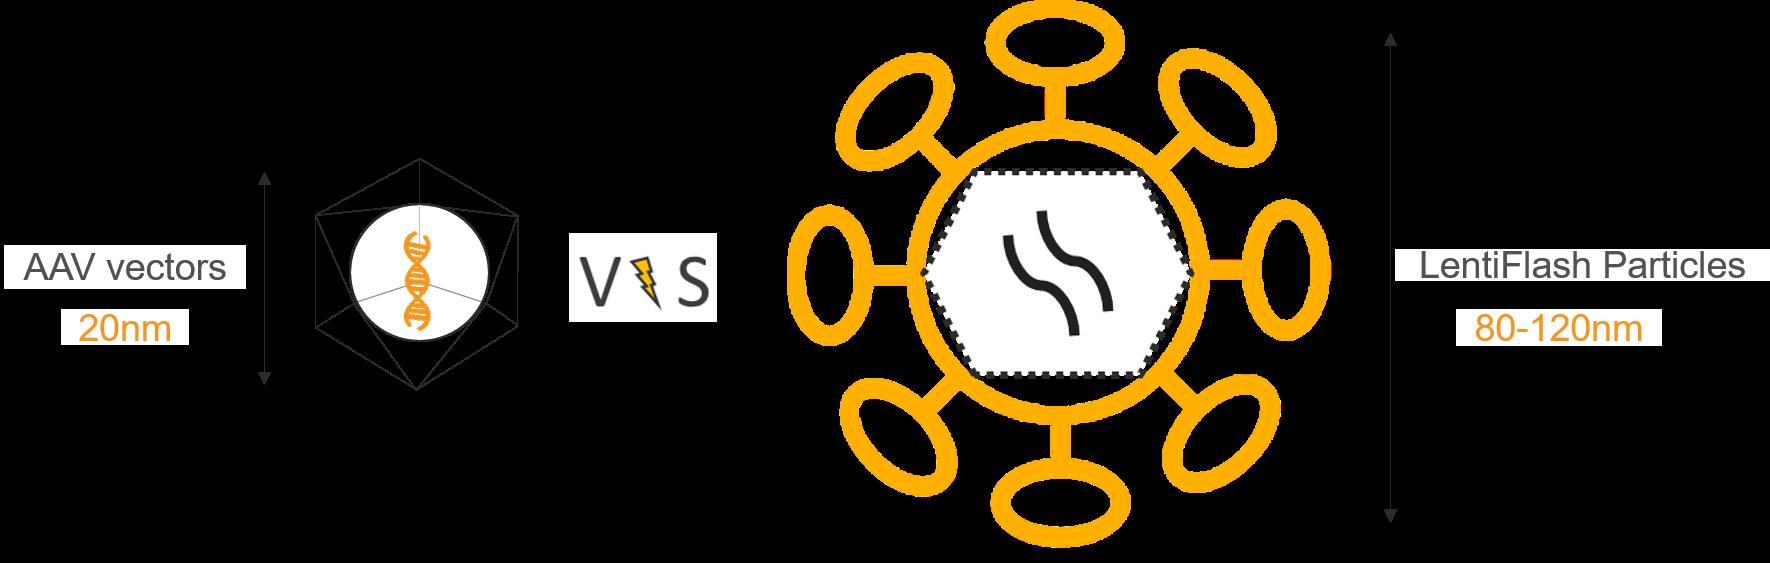 AAV vs LentiFlash